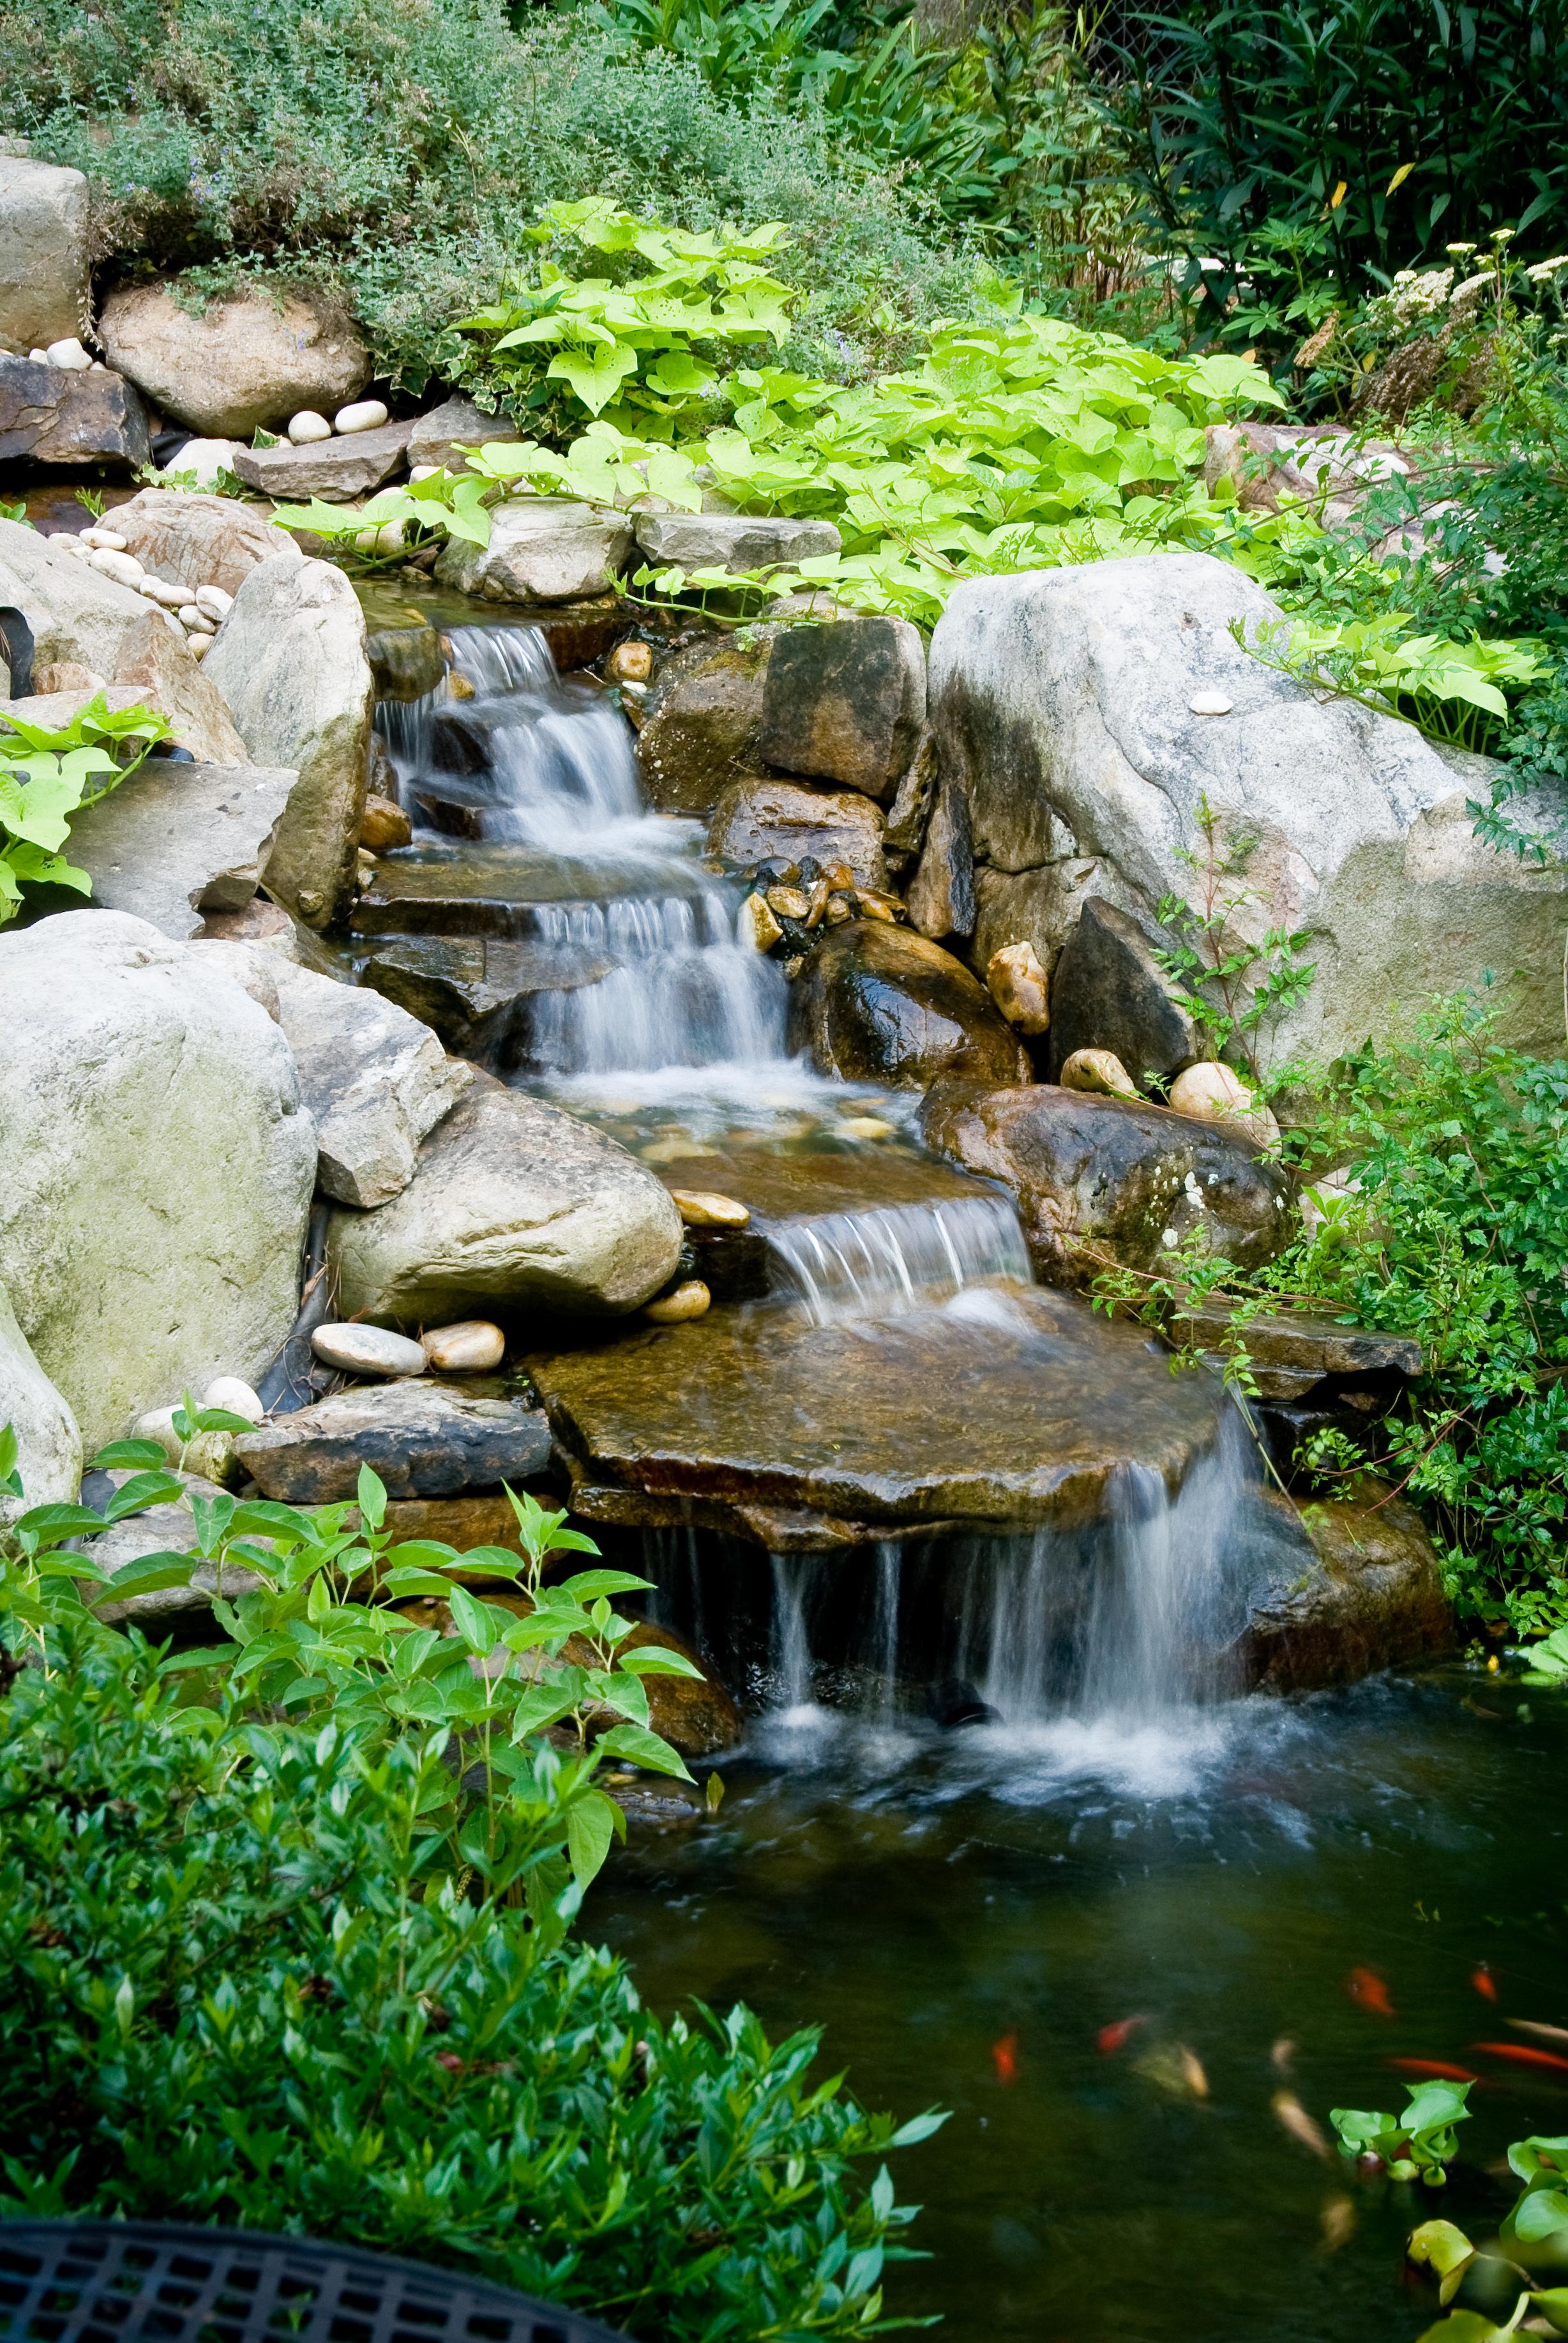 landscape water features - McPlants